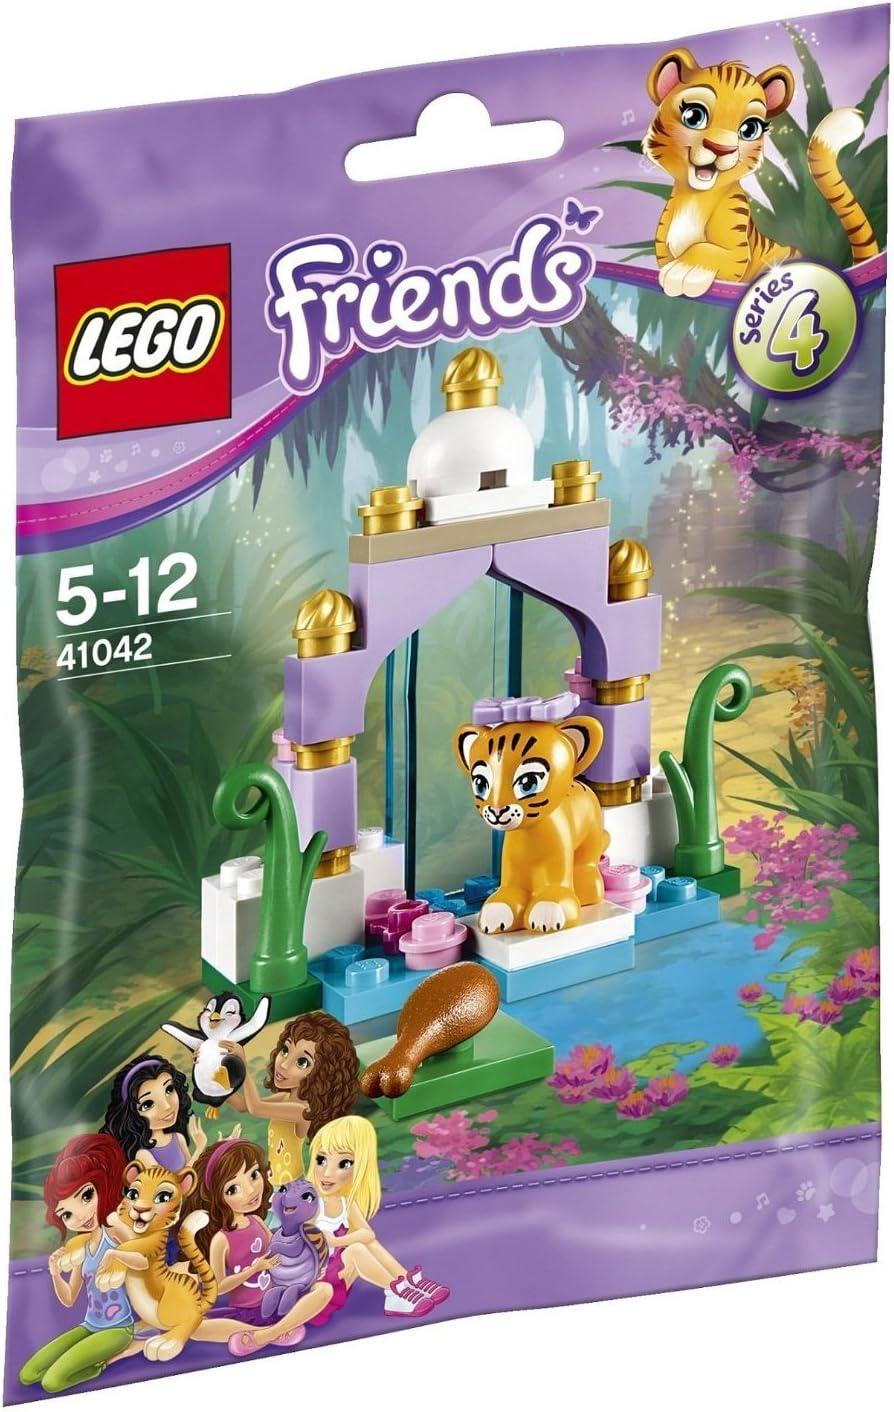 Lego Friends Tiger's Beautiful Temple 41042 Building Kit